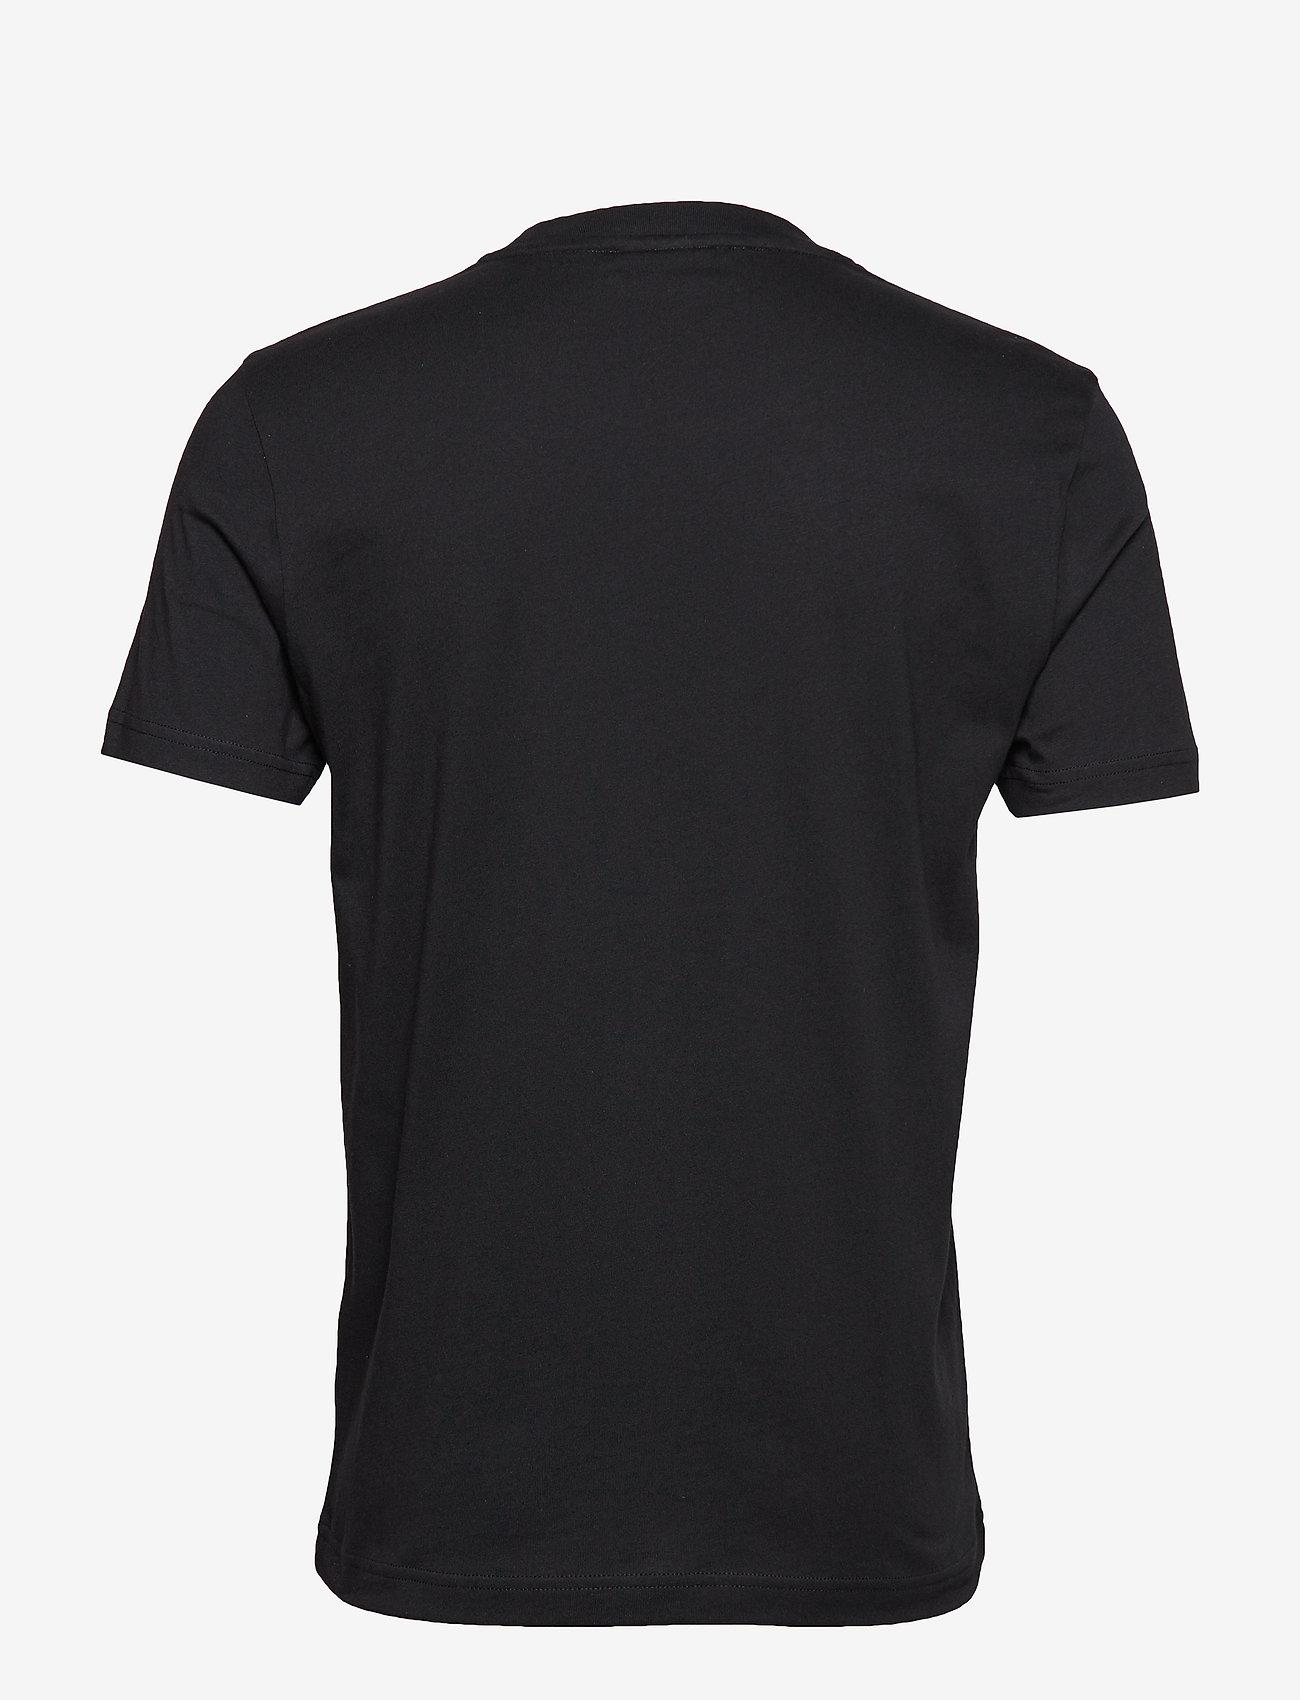 Calvin Klein - COTTON CHEST LOGO T-SHIRT - basic t-shirts - calvin black - 1